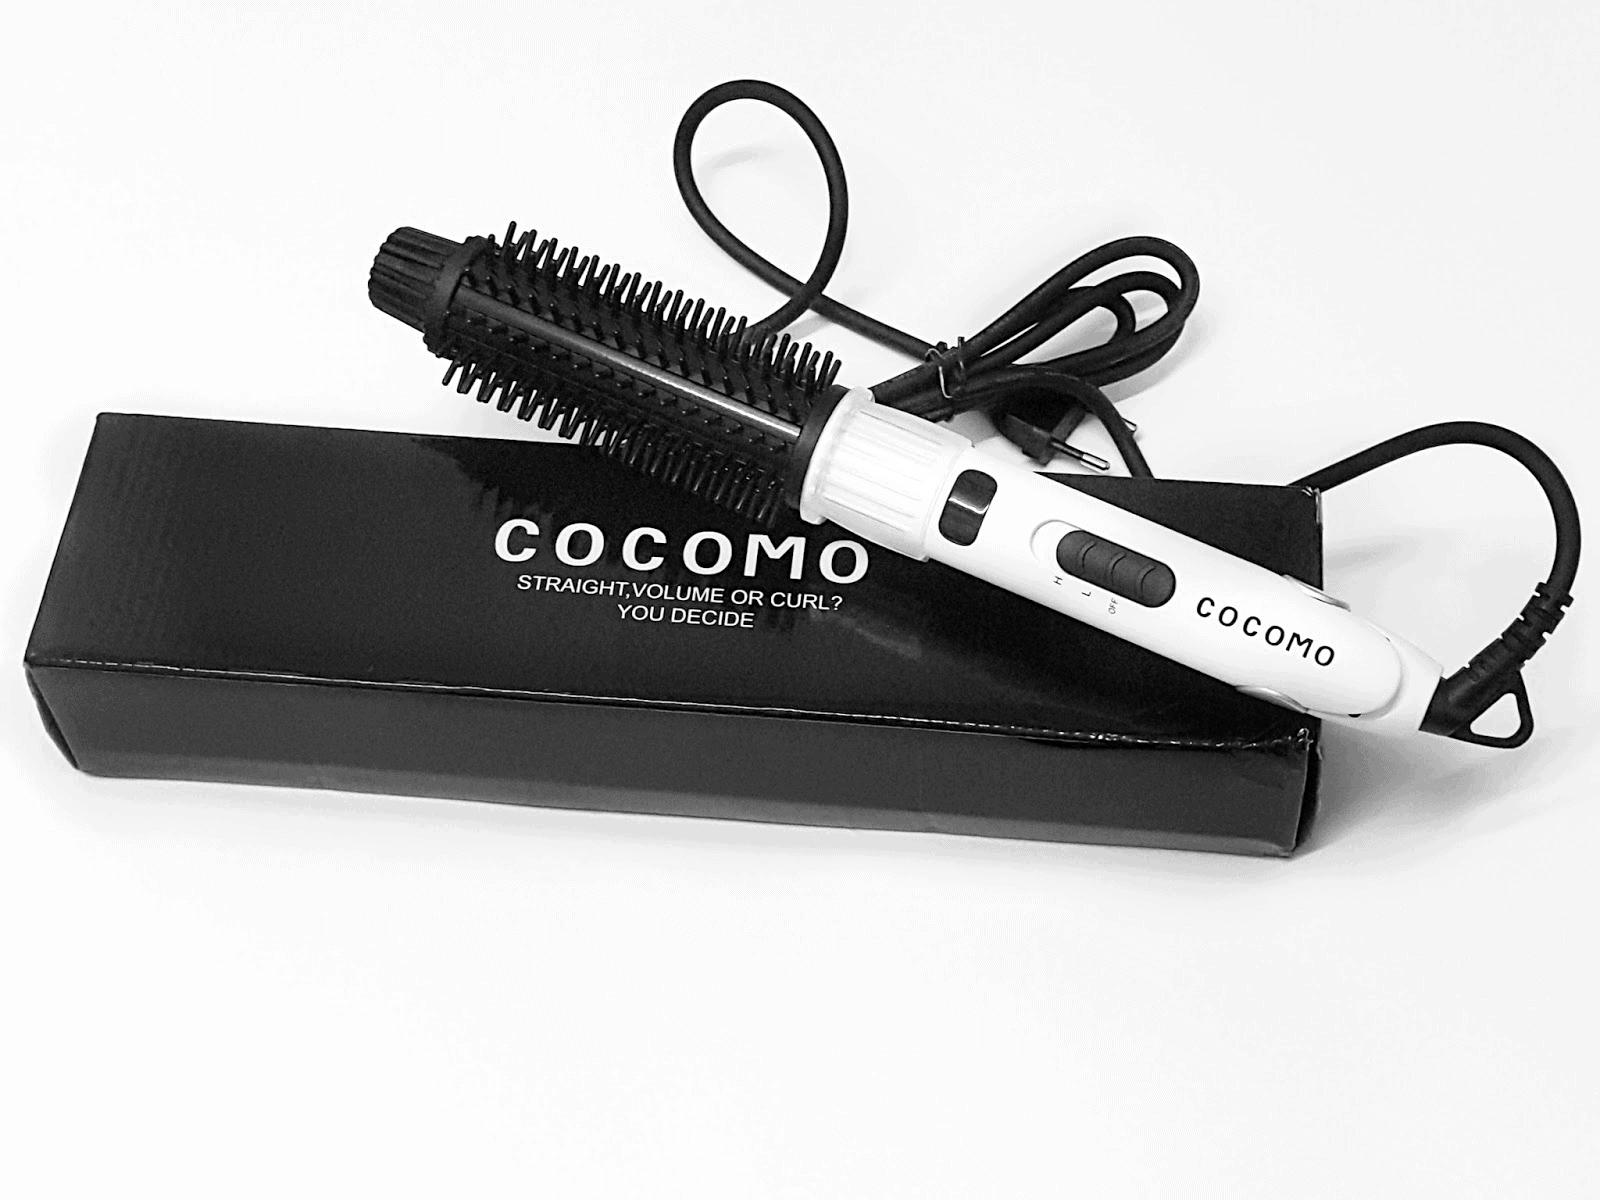 Cocomo 2 in 1 Hair Straightener & Curler